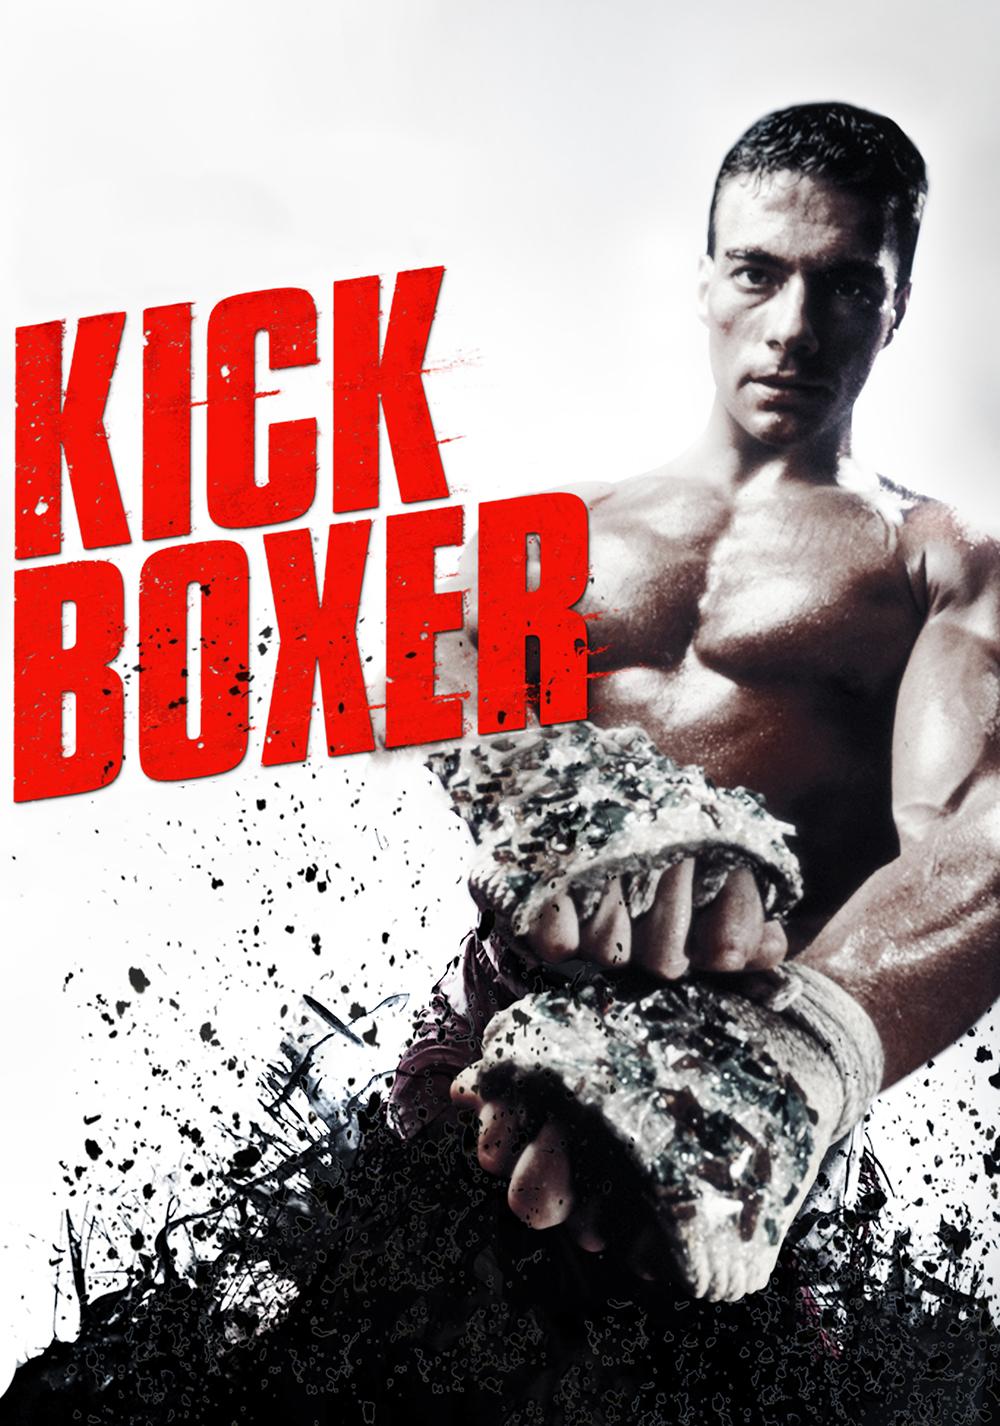 KICKBOXER (1989) MOVIE TAMIL DUBBED HD